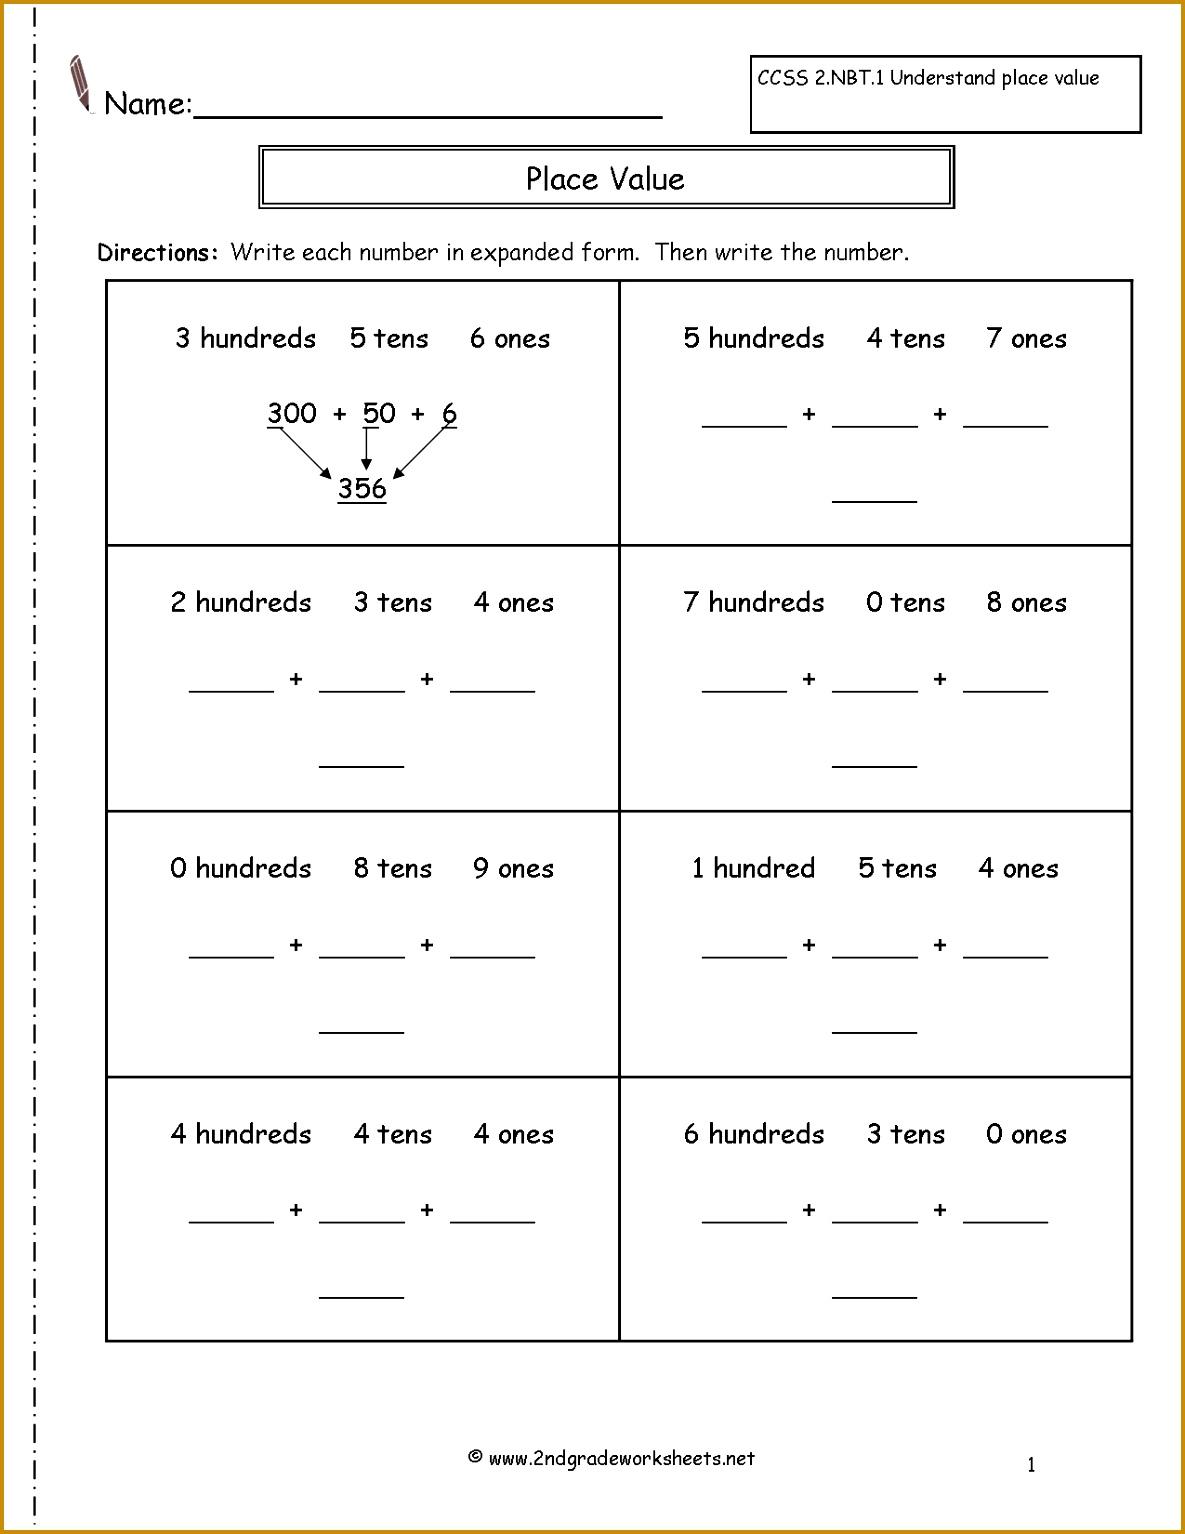 Place Value Expanded Form Worksheets Worksheets for all Download and Worksheets 15341185